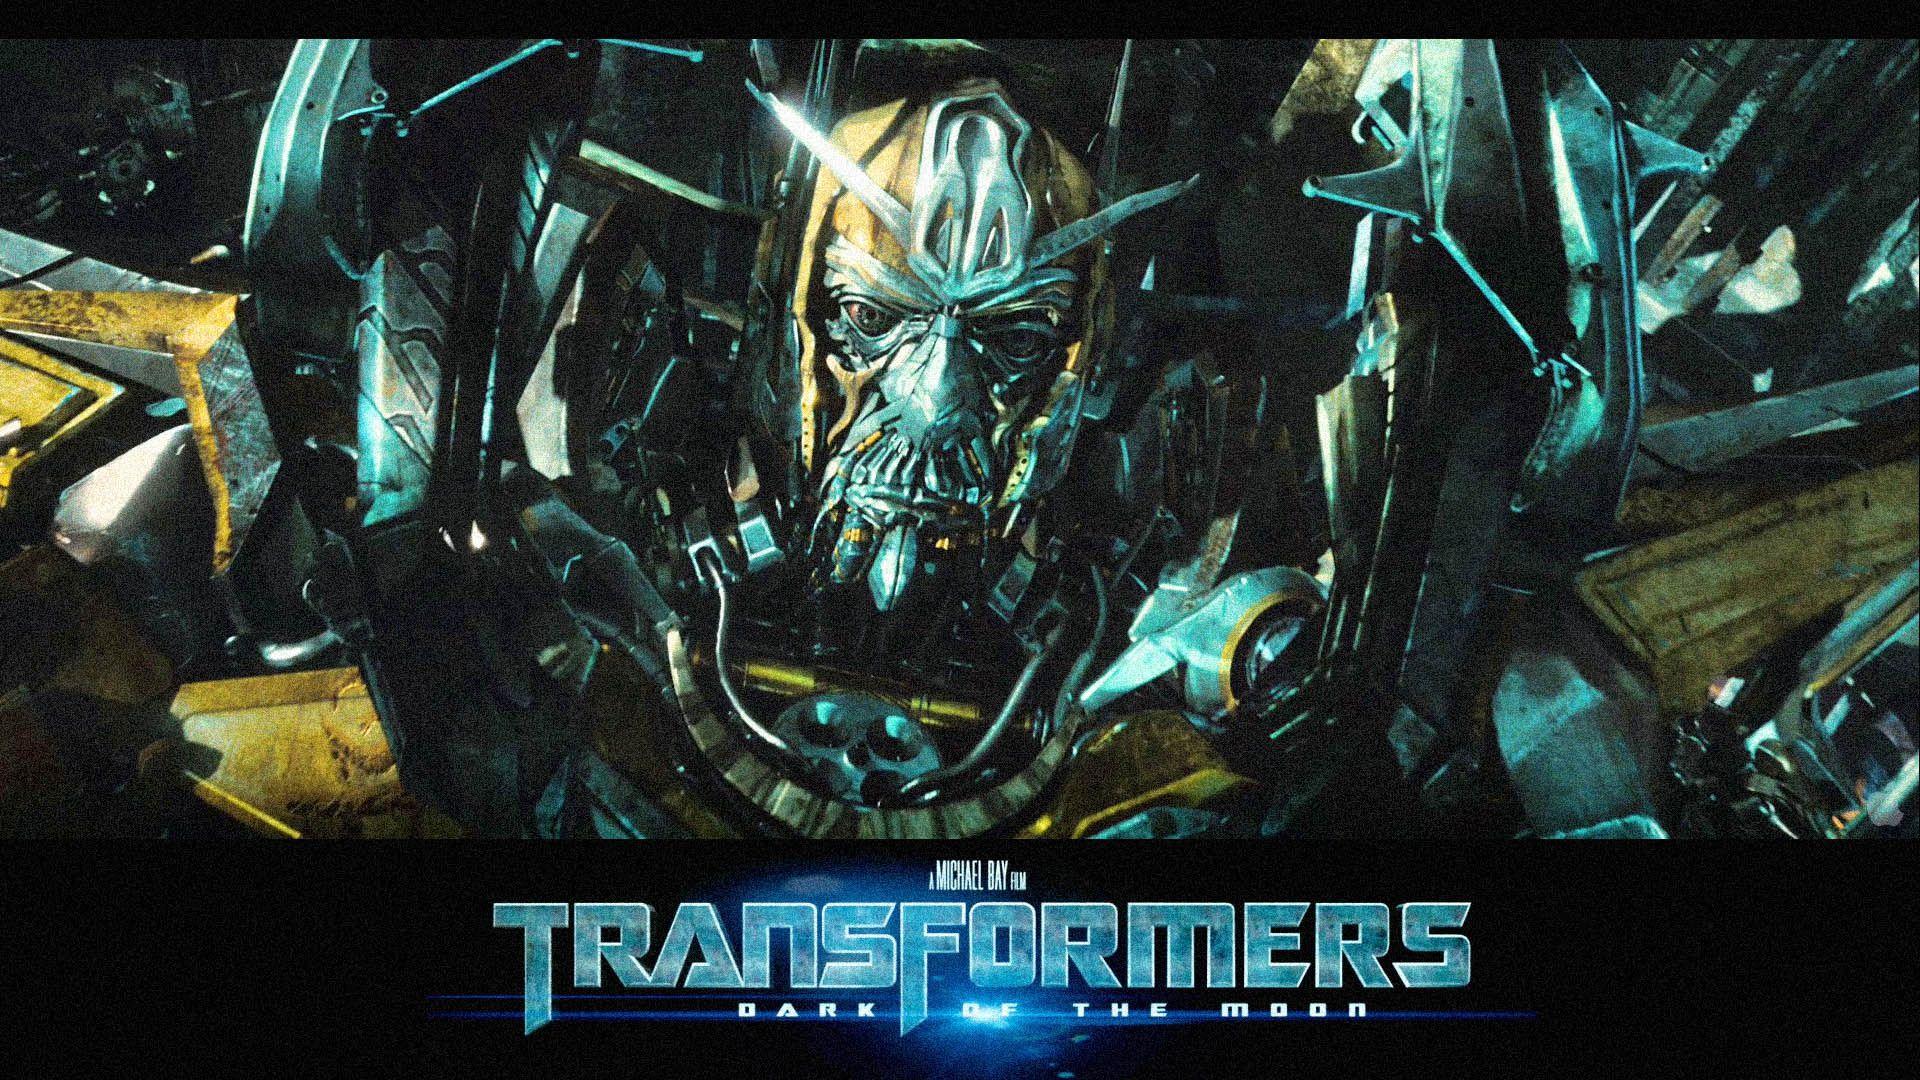 transformer hd wallpapers 1920×1080 transformers 3 hd wallpapers (46